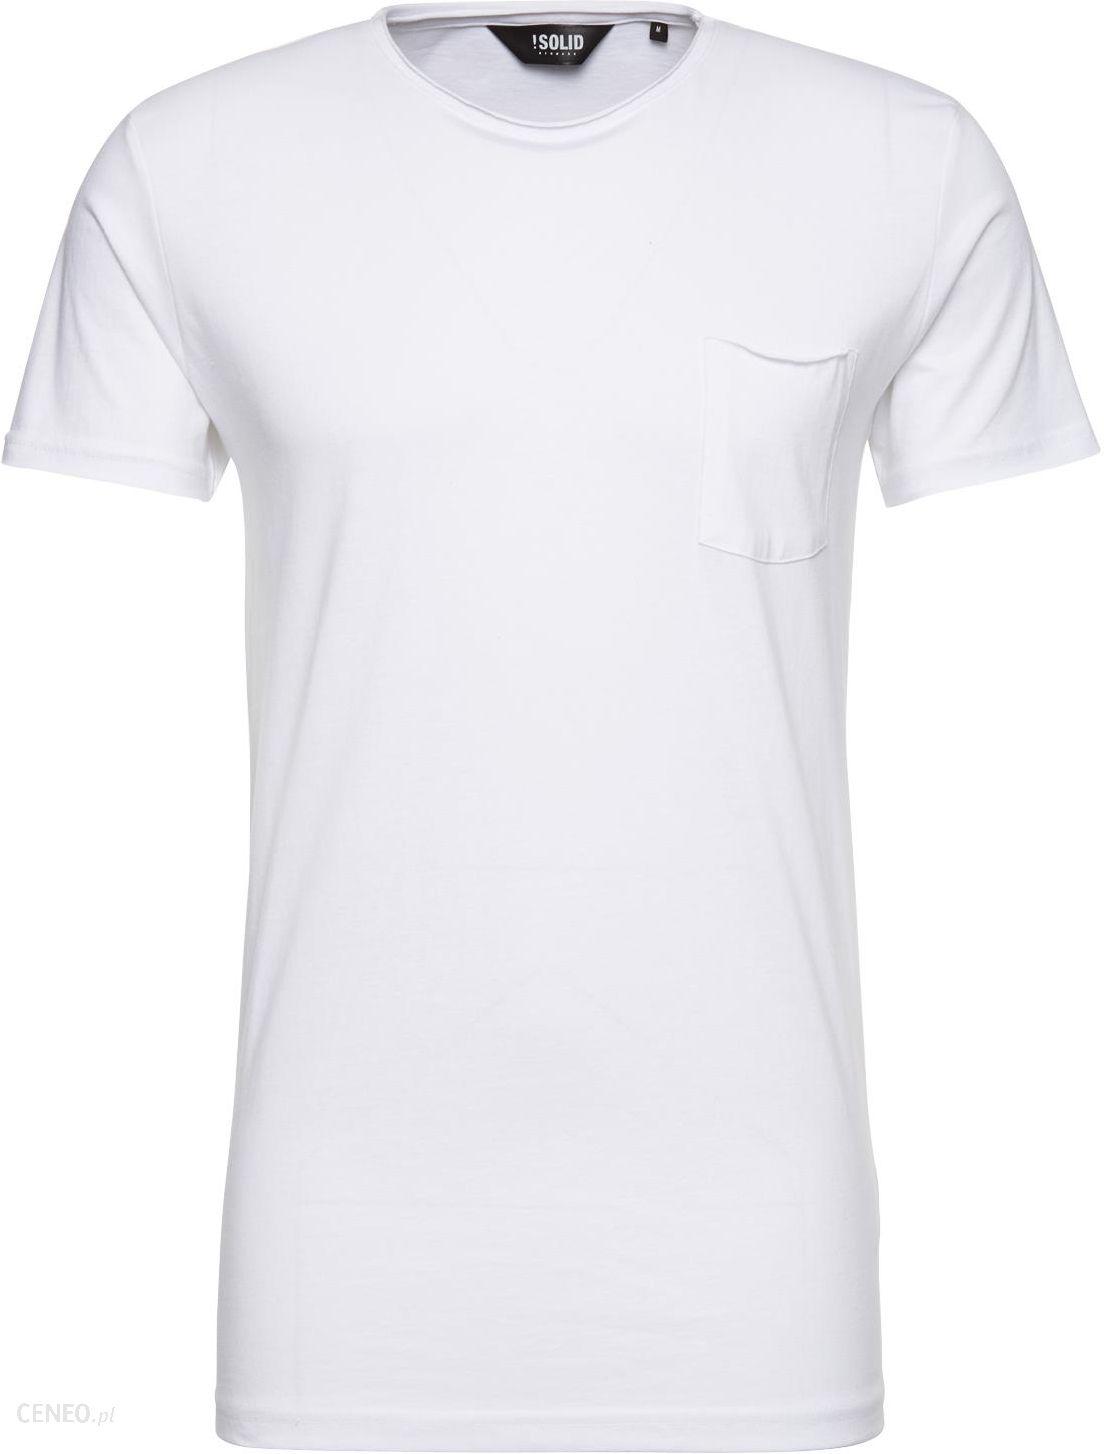 Nike Performance SOLID Koszulka sportowa white